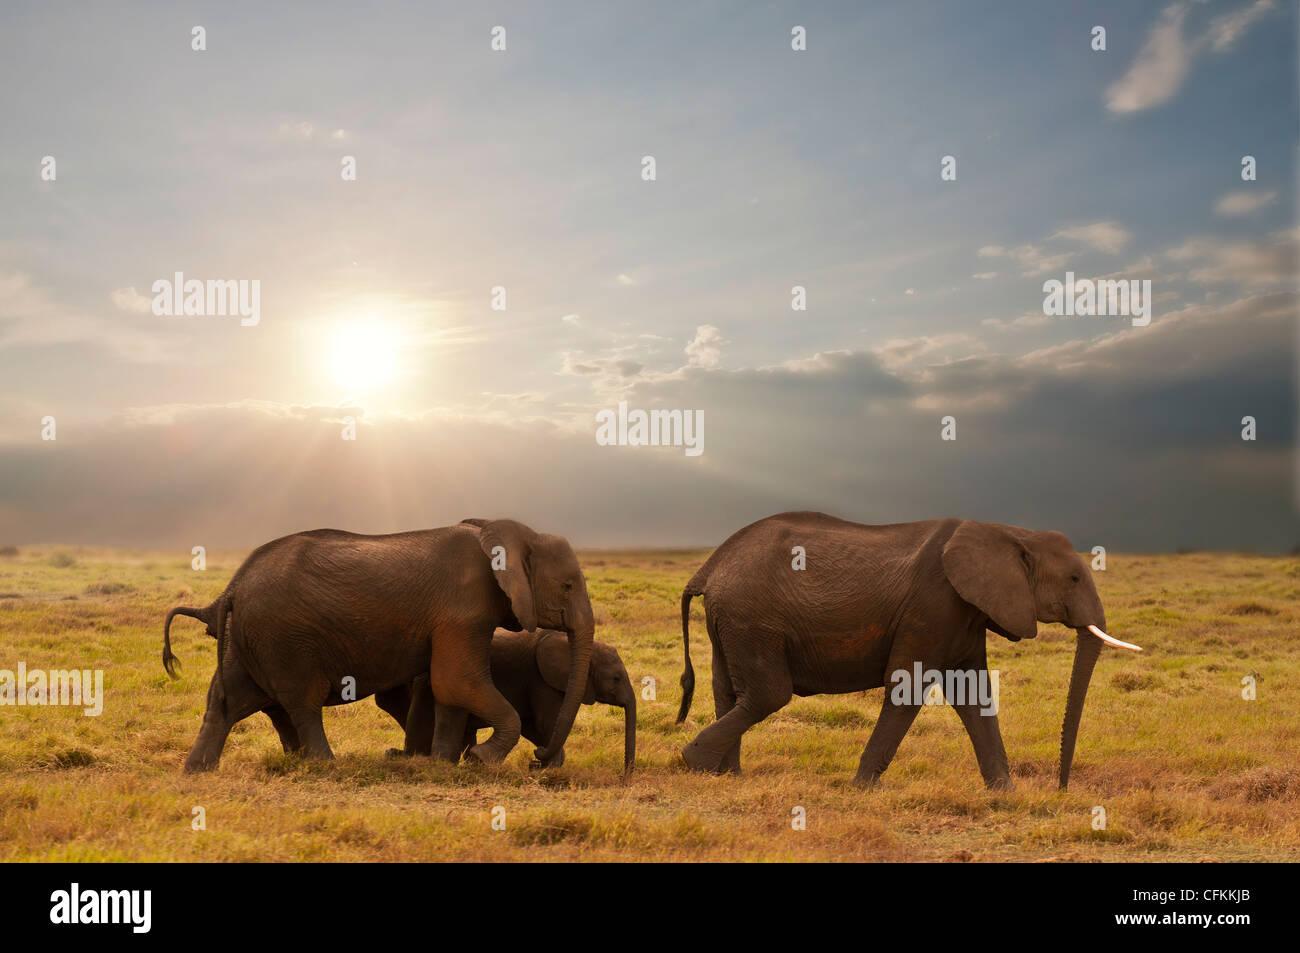 Familia de elefantes en el Parque Nacional Amboseli, Kenia Imagen De Stock